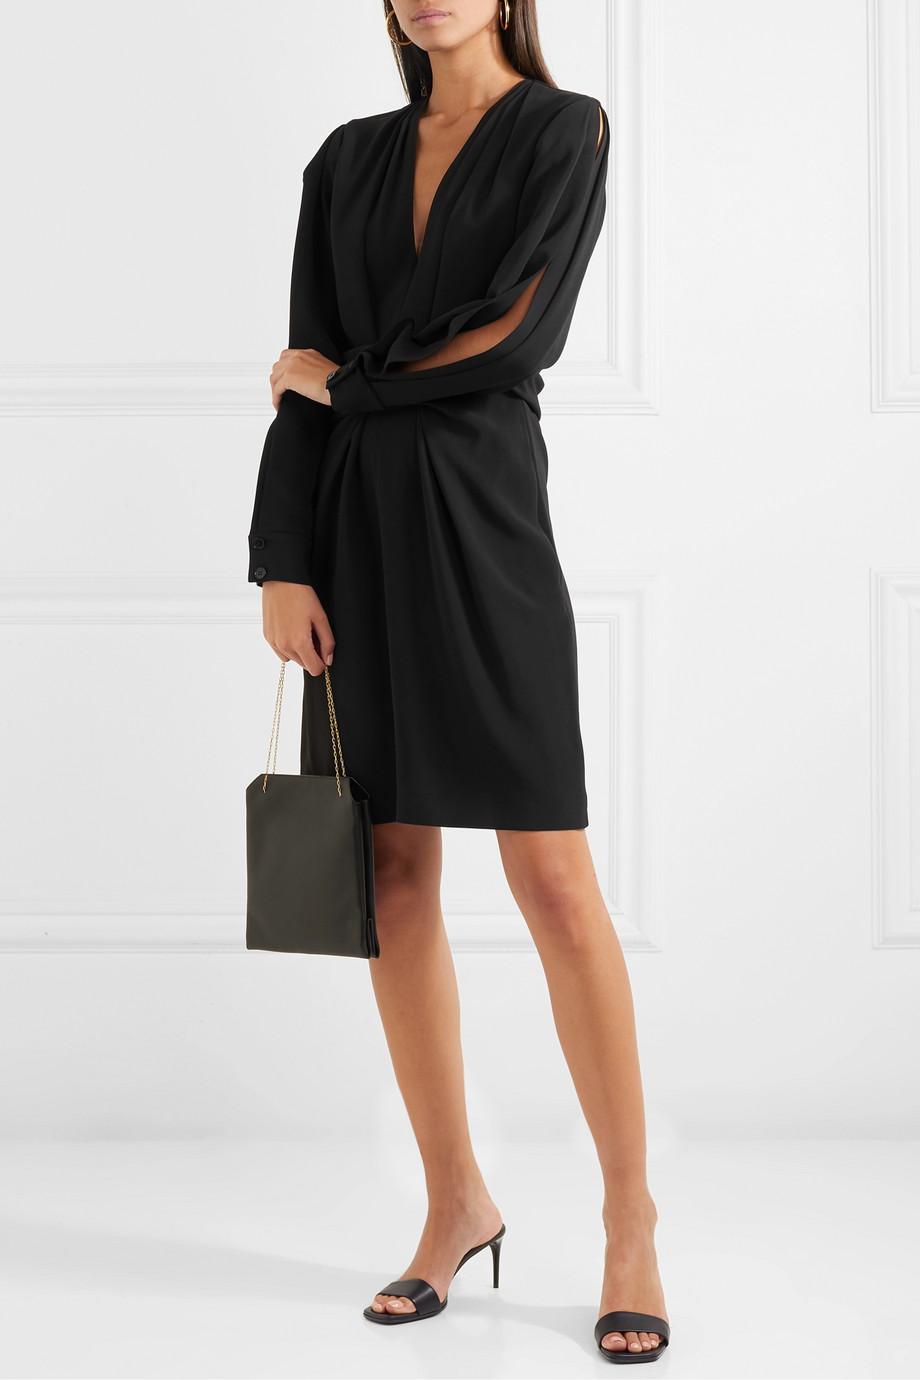 Stella McCartney + NET SUSTAIN tie-detailed cady dress